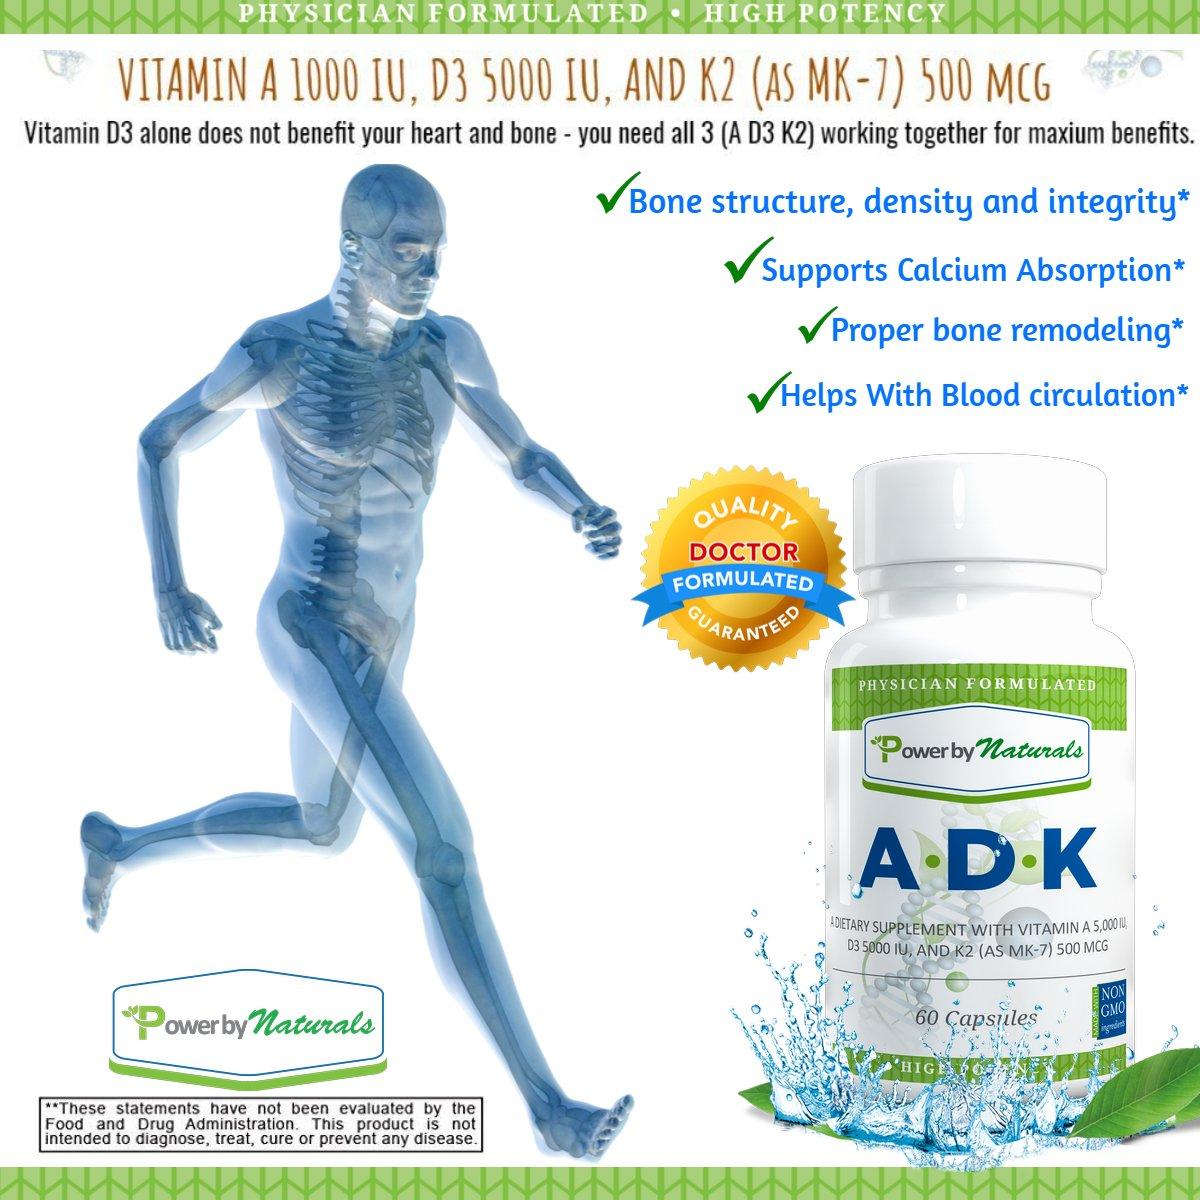 Amazon.com: Vitamin ADK ~ High Potency [ Vitamin A 5000 iu | D3 5000 iu| K2 (as MK-7) 500mcg ] Supplement For Bone Strength and Heart Health, Dr. Formulated ...